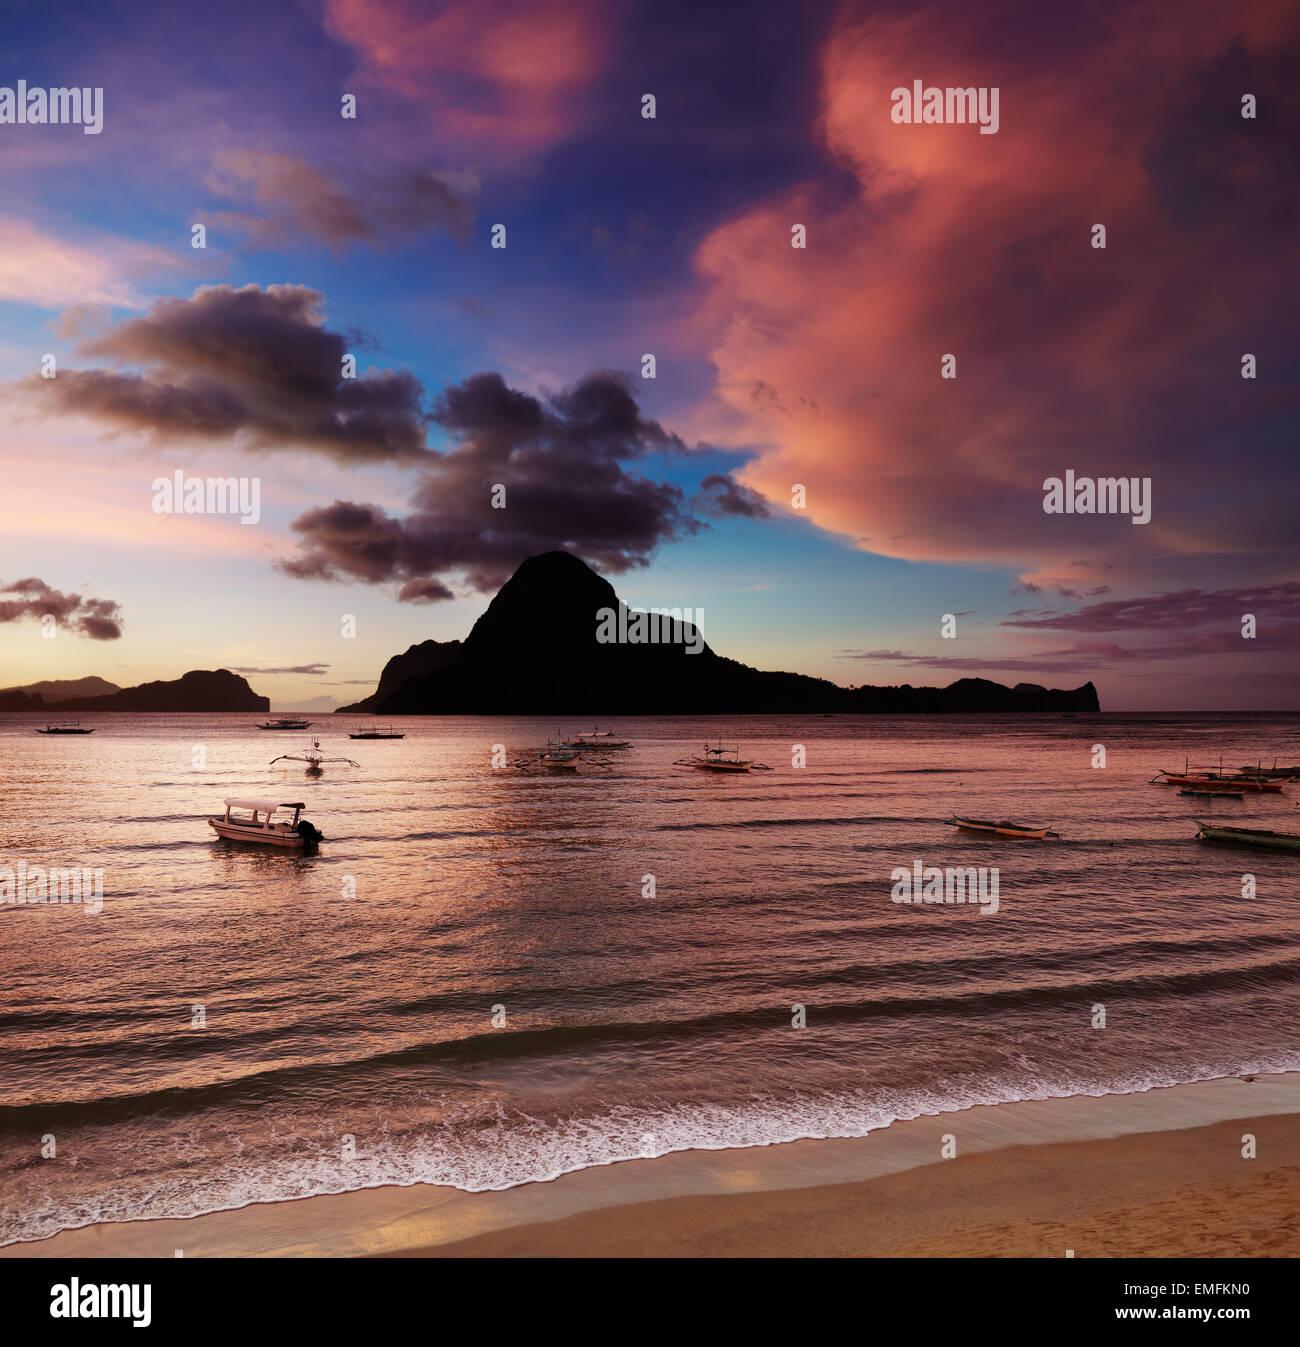 El Nido-Bucht und Cadlao Insel bei Sonnenuntergang, Palawan, Philippinen Stockbild